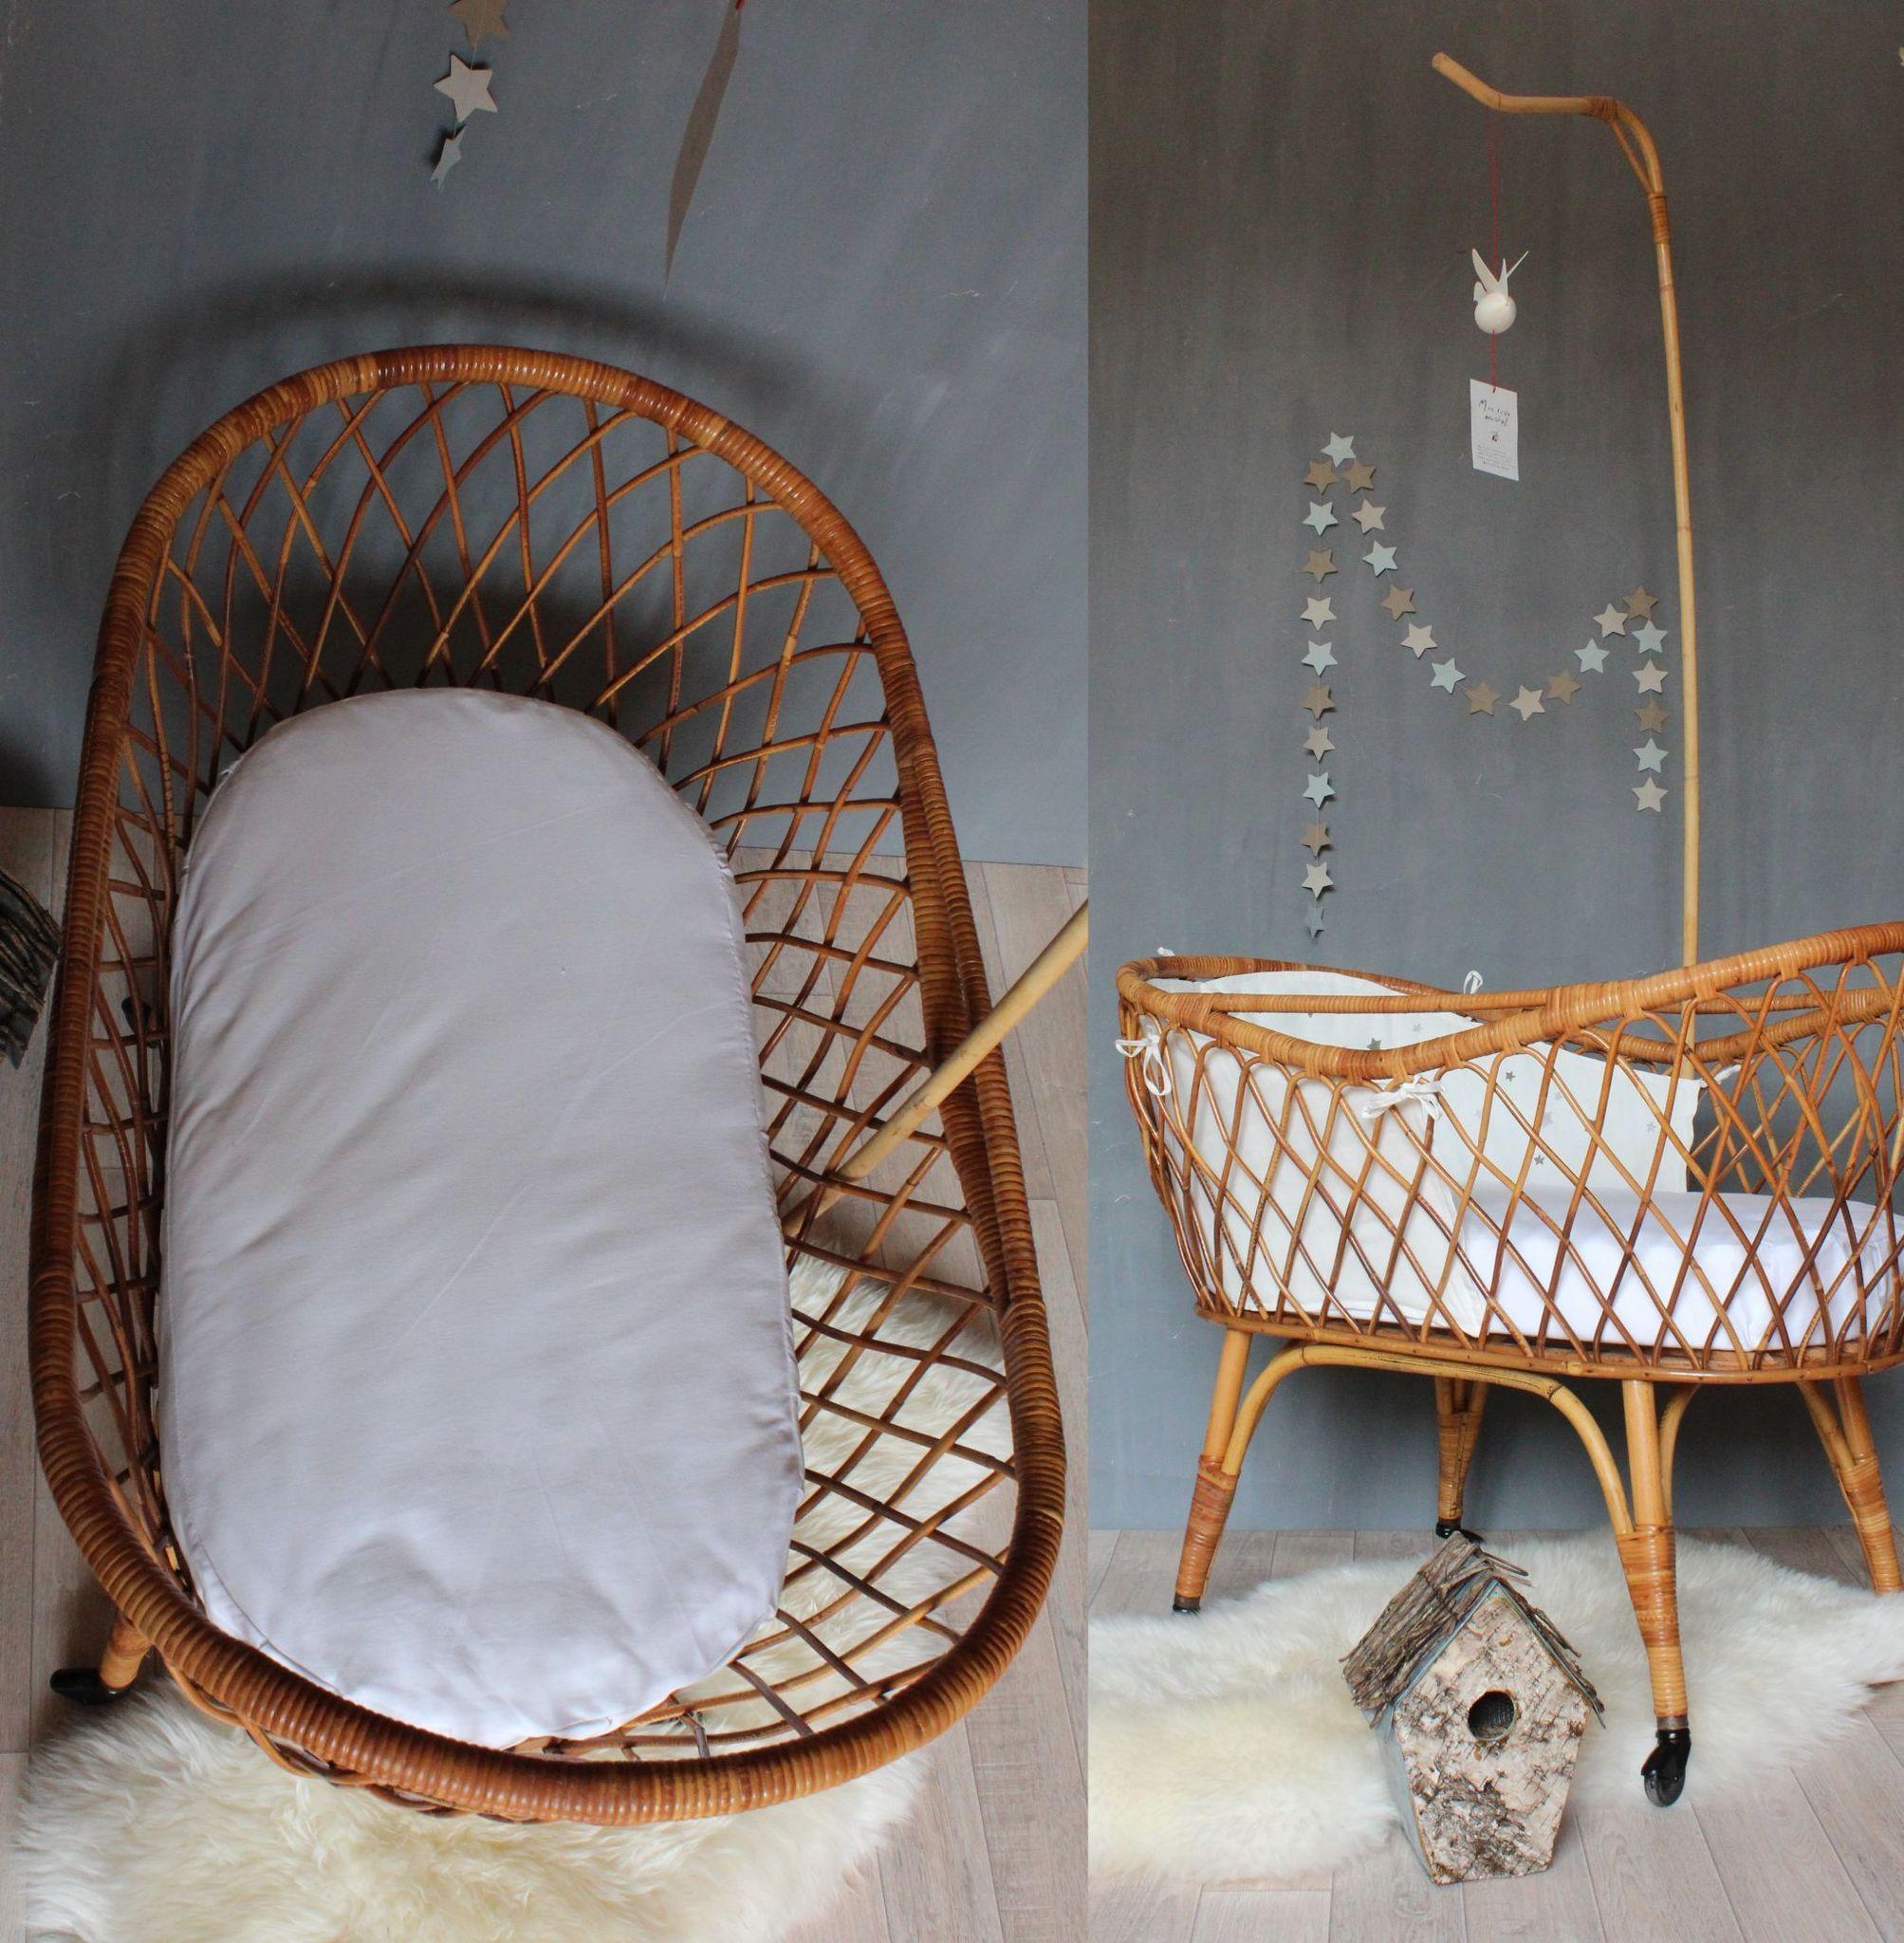 berceau enfant rotin trendy little chambres d 39 enfants kids room pinterest berceau rotin. Black Bedroom Furniture Sets. Home Design Ideas